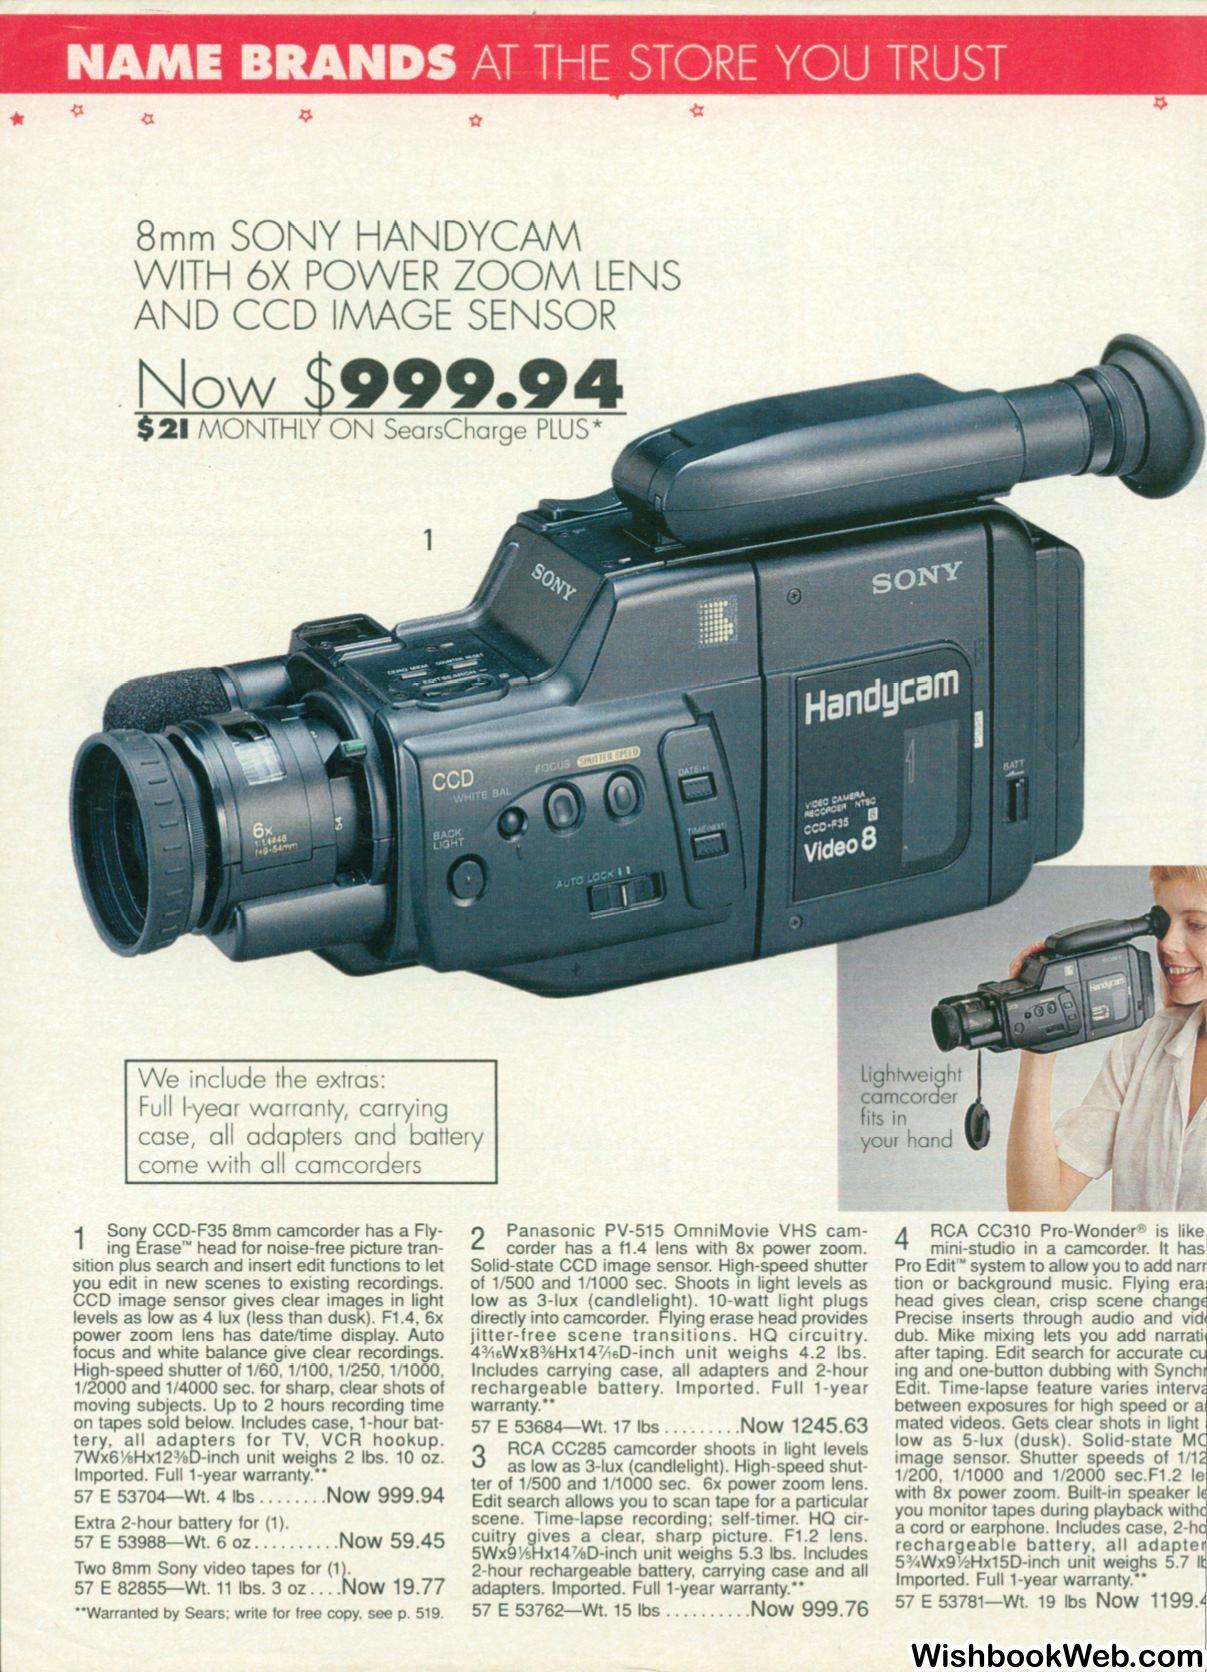 1989 Sears Wishbook